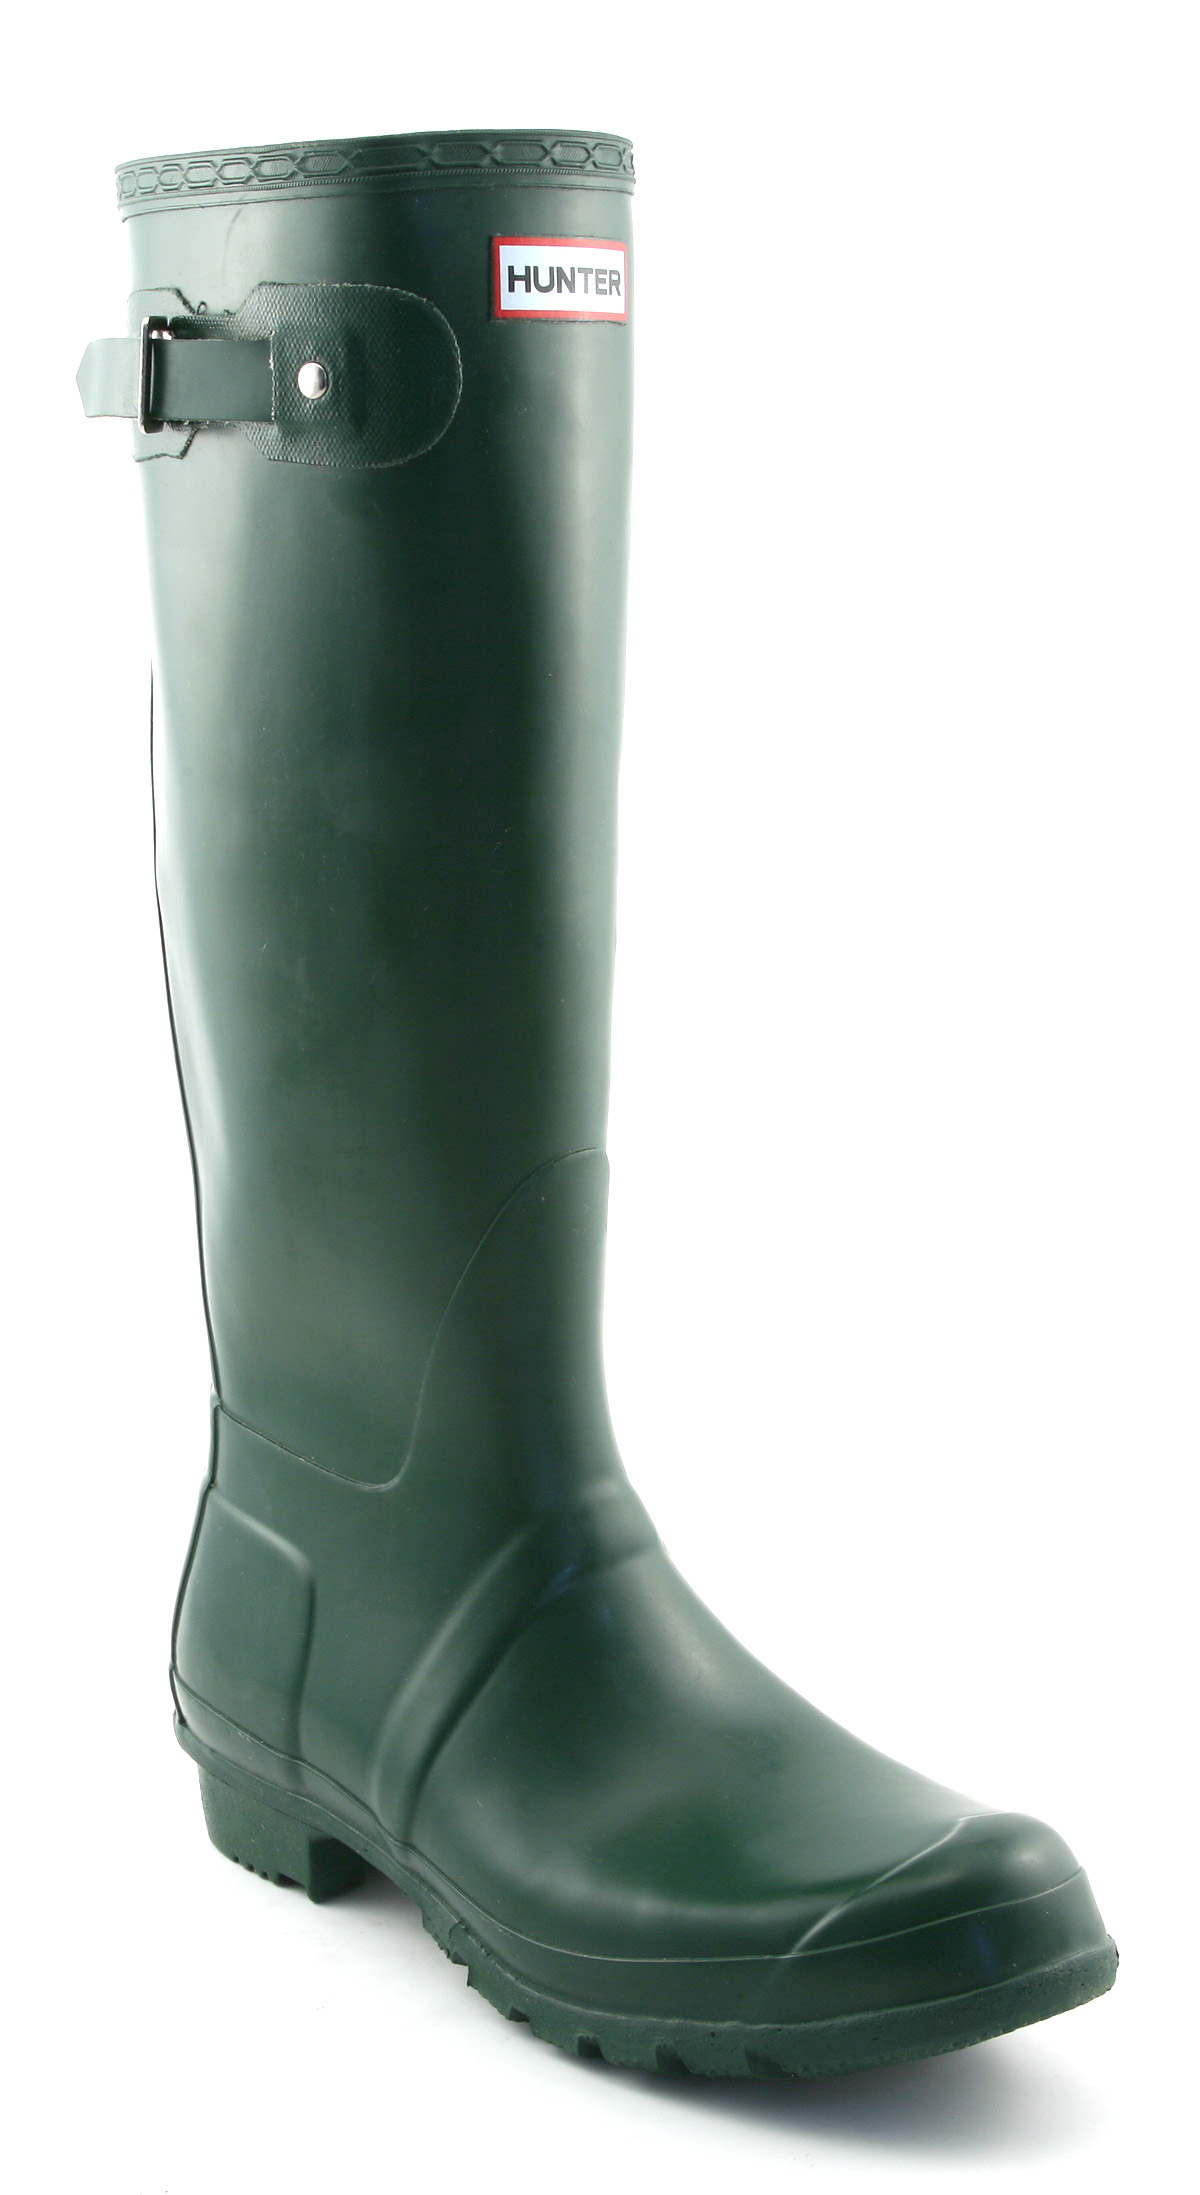 Mens Hunter Original Welly Green Rubber Boots | eBay